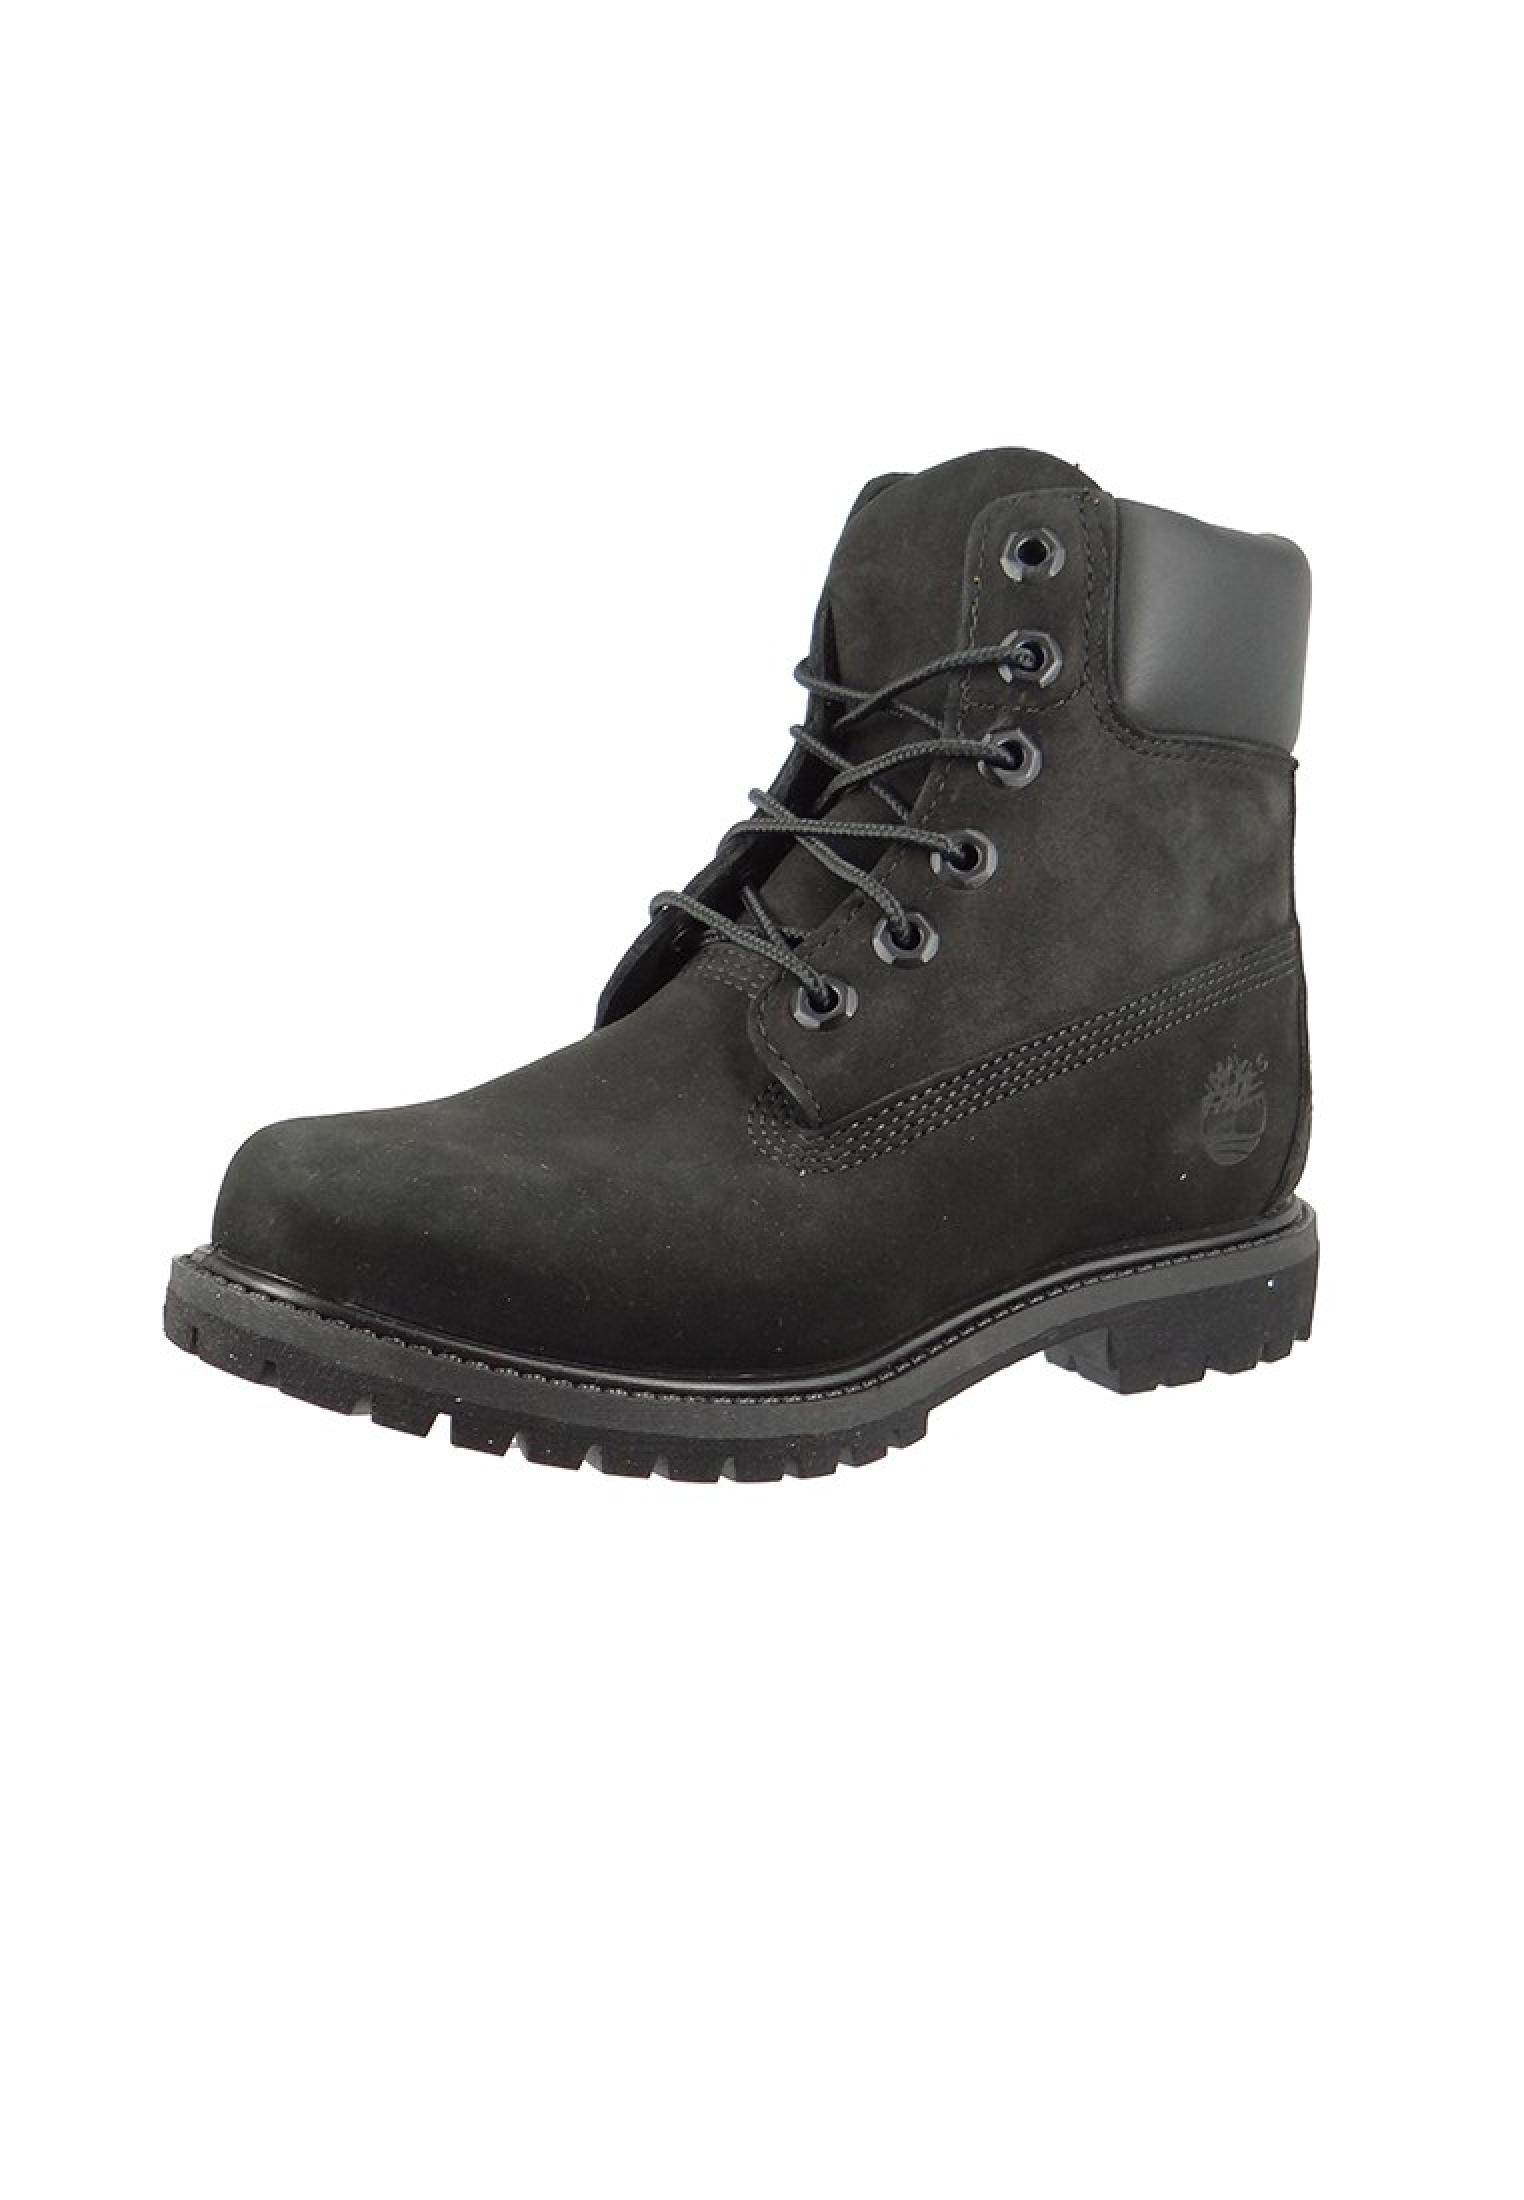 new product e8749 709b9 Timberland Damen Stiefel 6 Inch Premium Boot Leder Black Waterbuck Schwarz  8658A